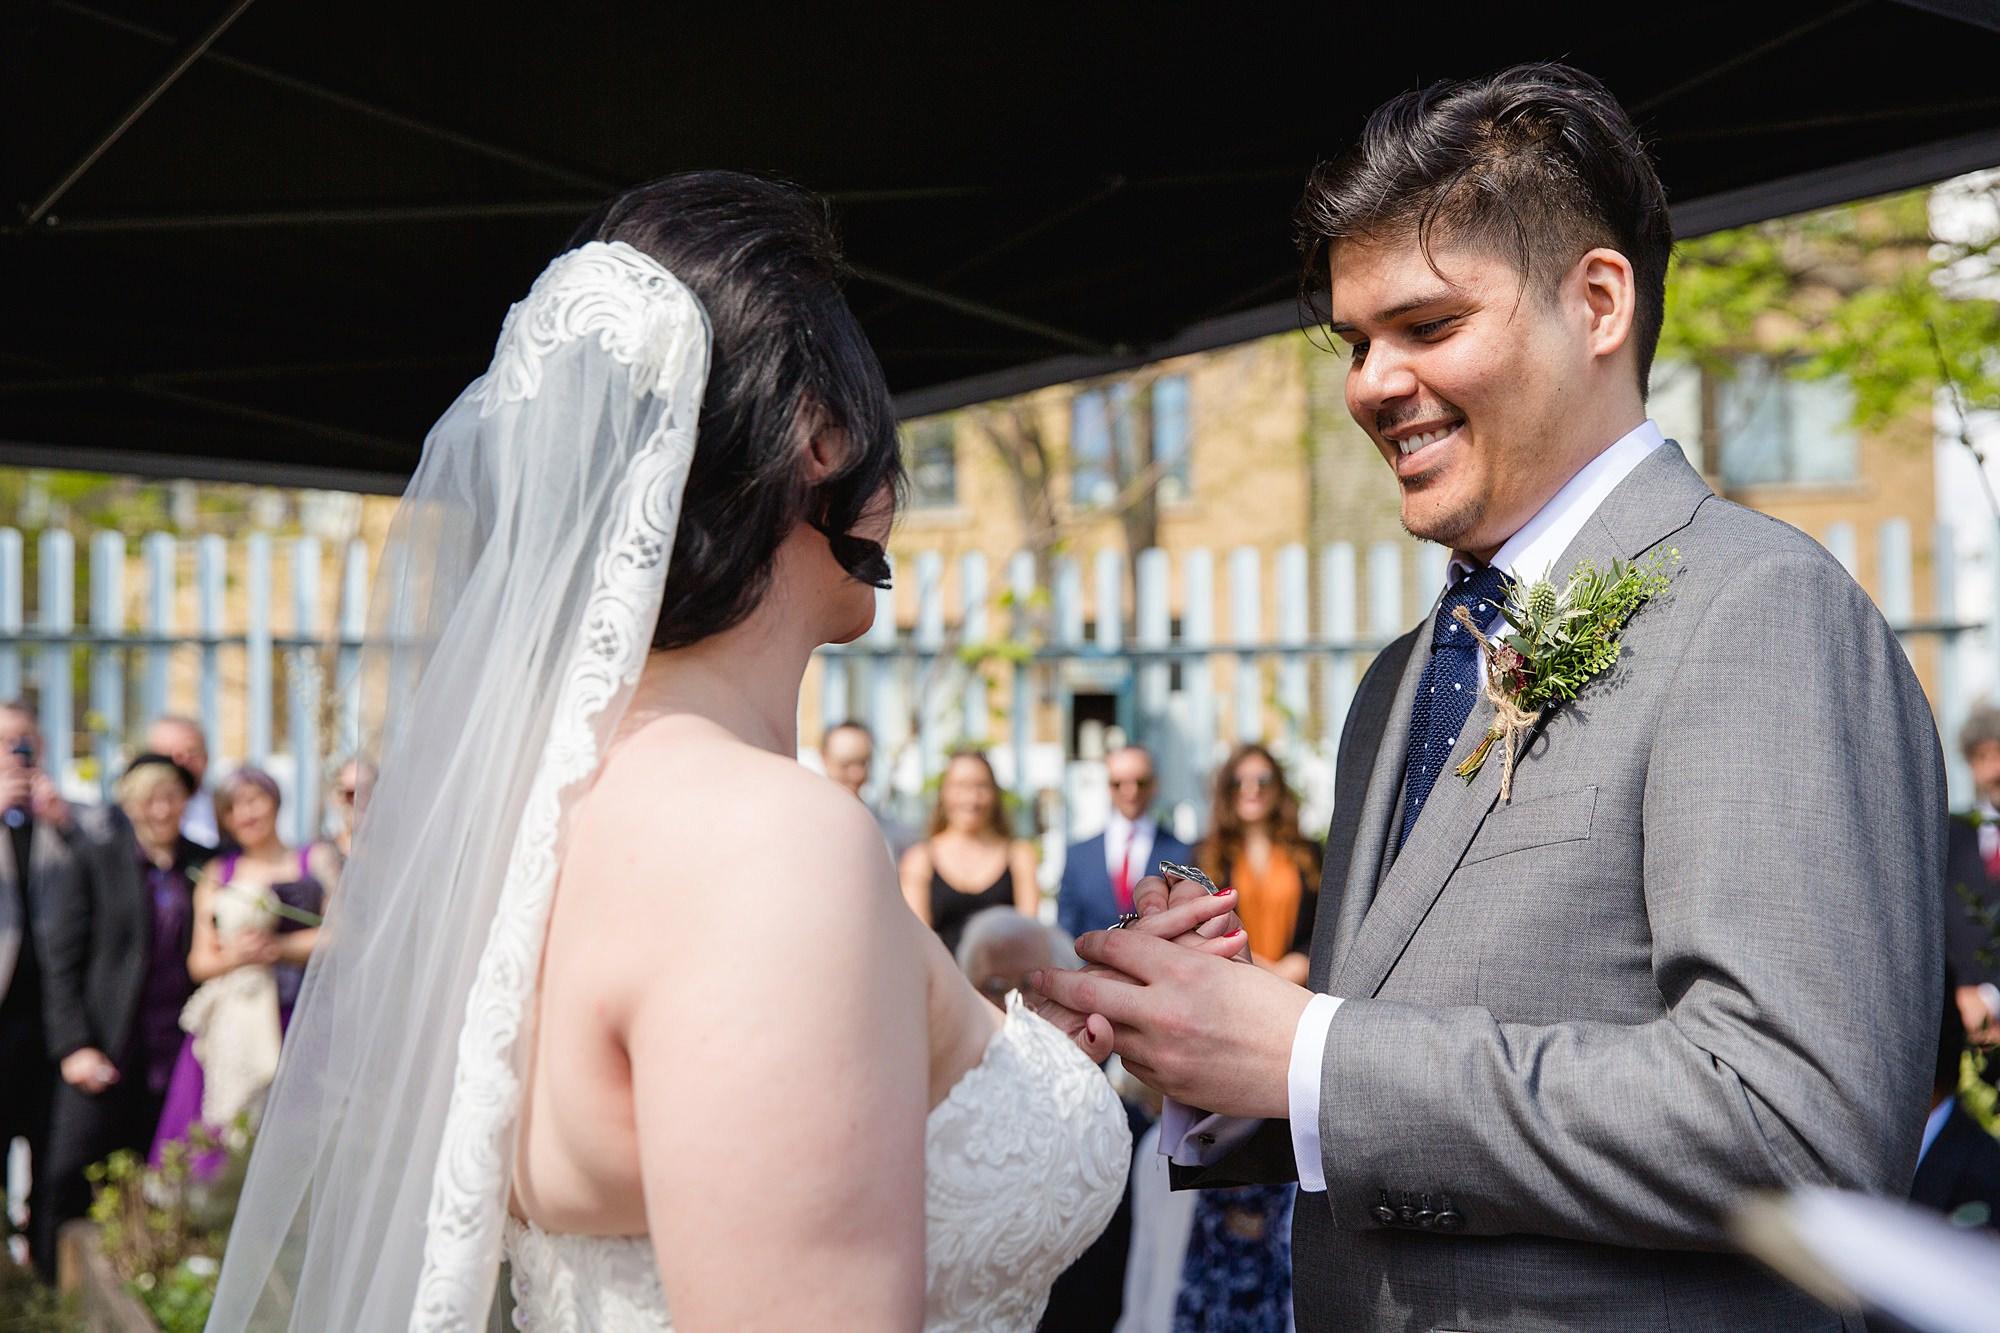 Brunel museum wedding bride and groom exchange rings